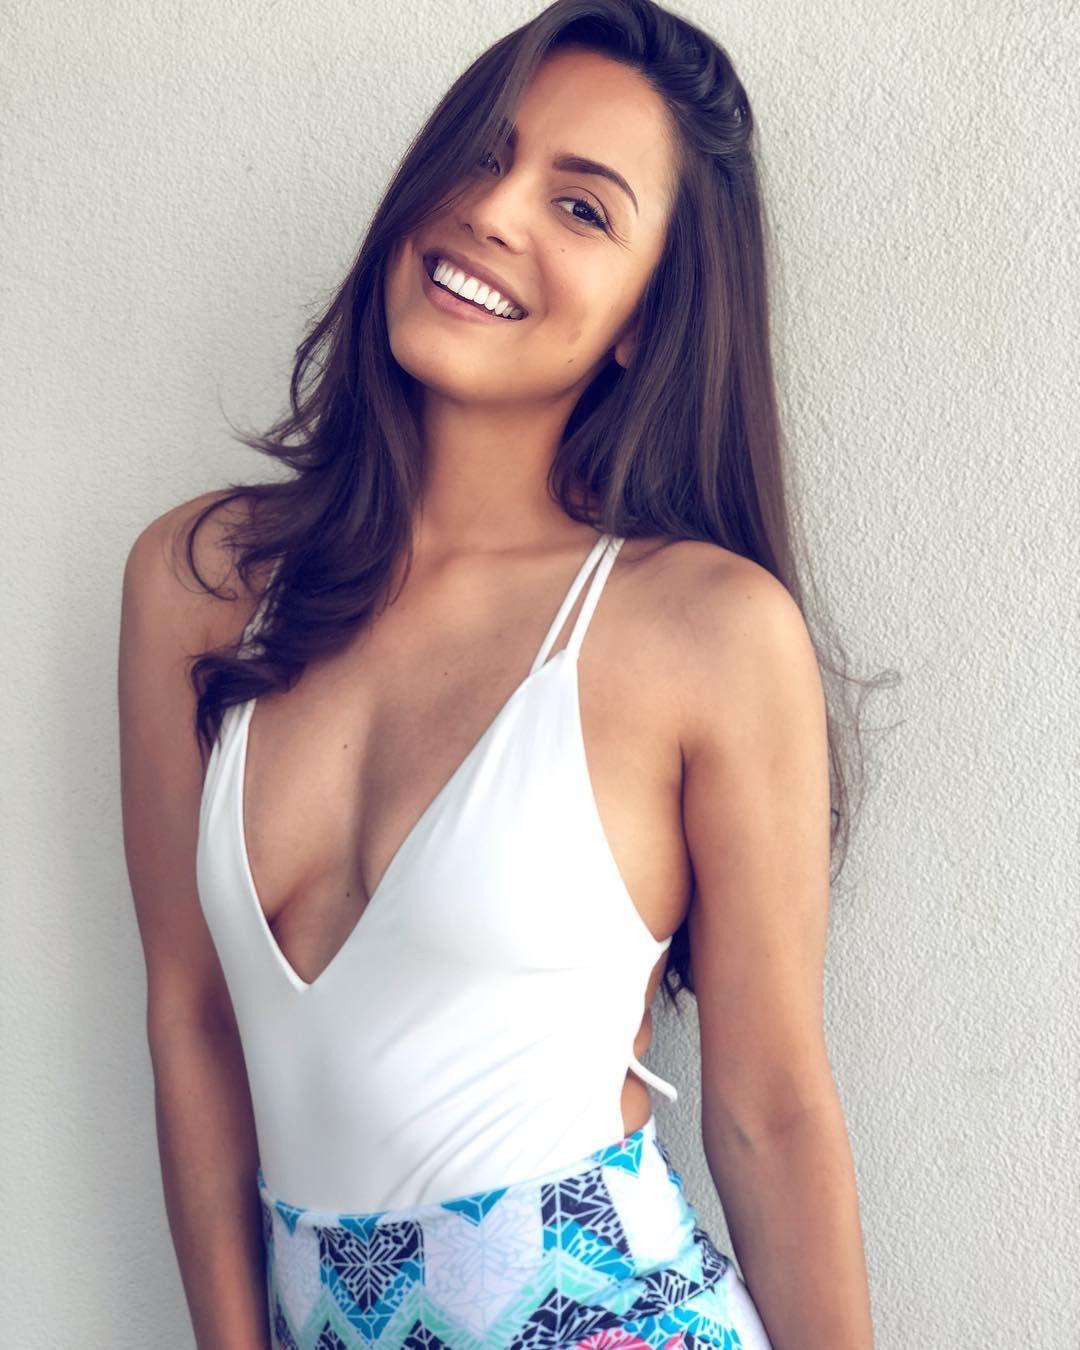 Instagram Raquel Pomplun